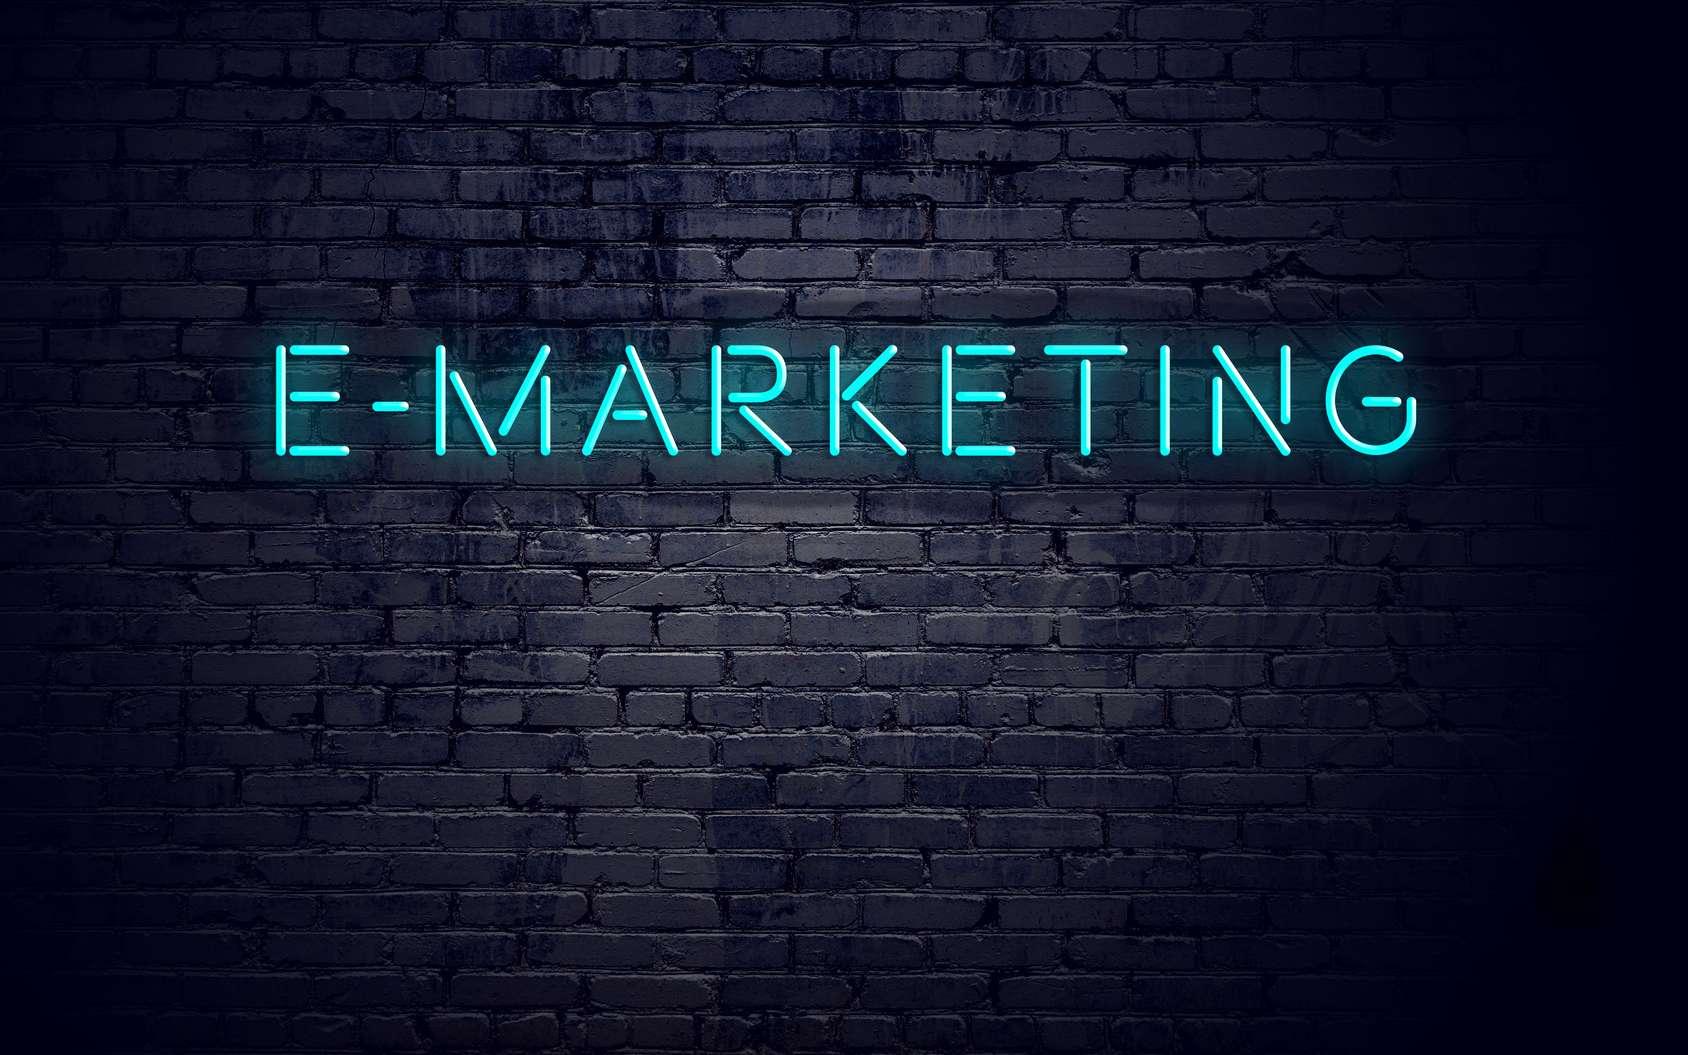 Le e-marketing, le nouvel enjeu des entreprises. © iushakovsky, Fotolia